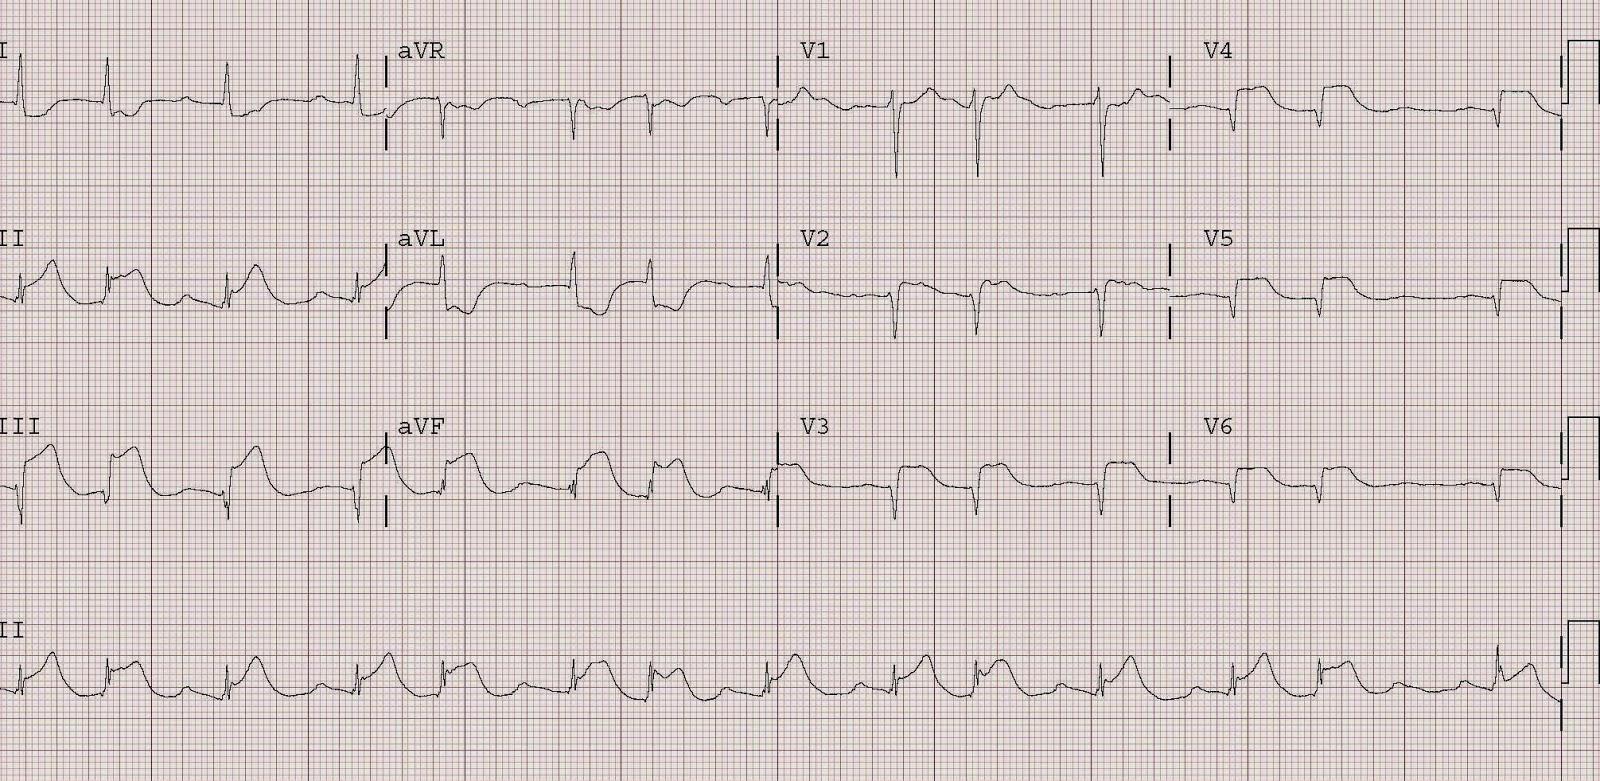 Dr Smith S Ecg Blog Cardiac Arrest Ventricular